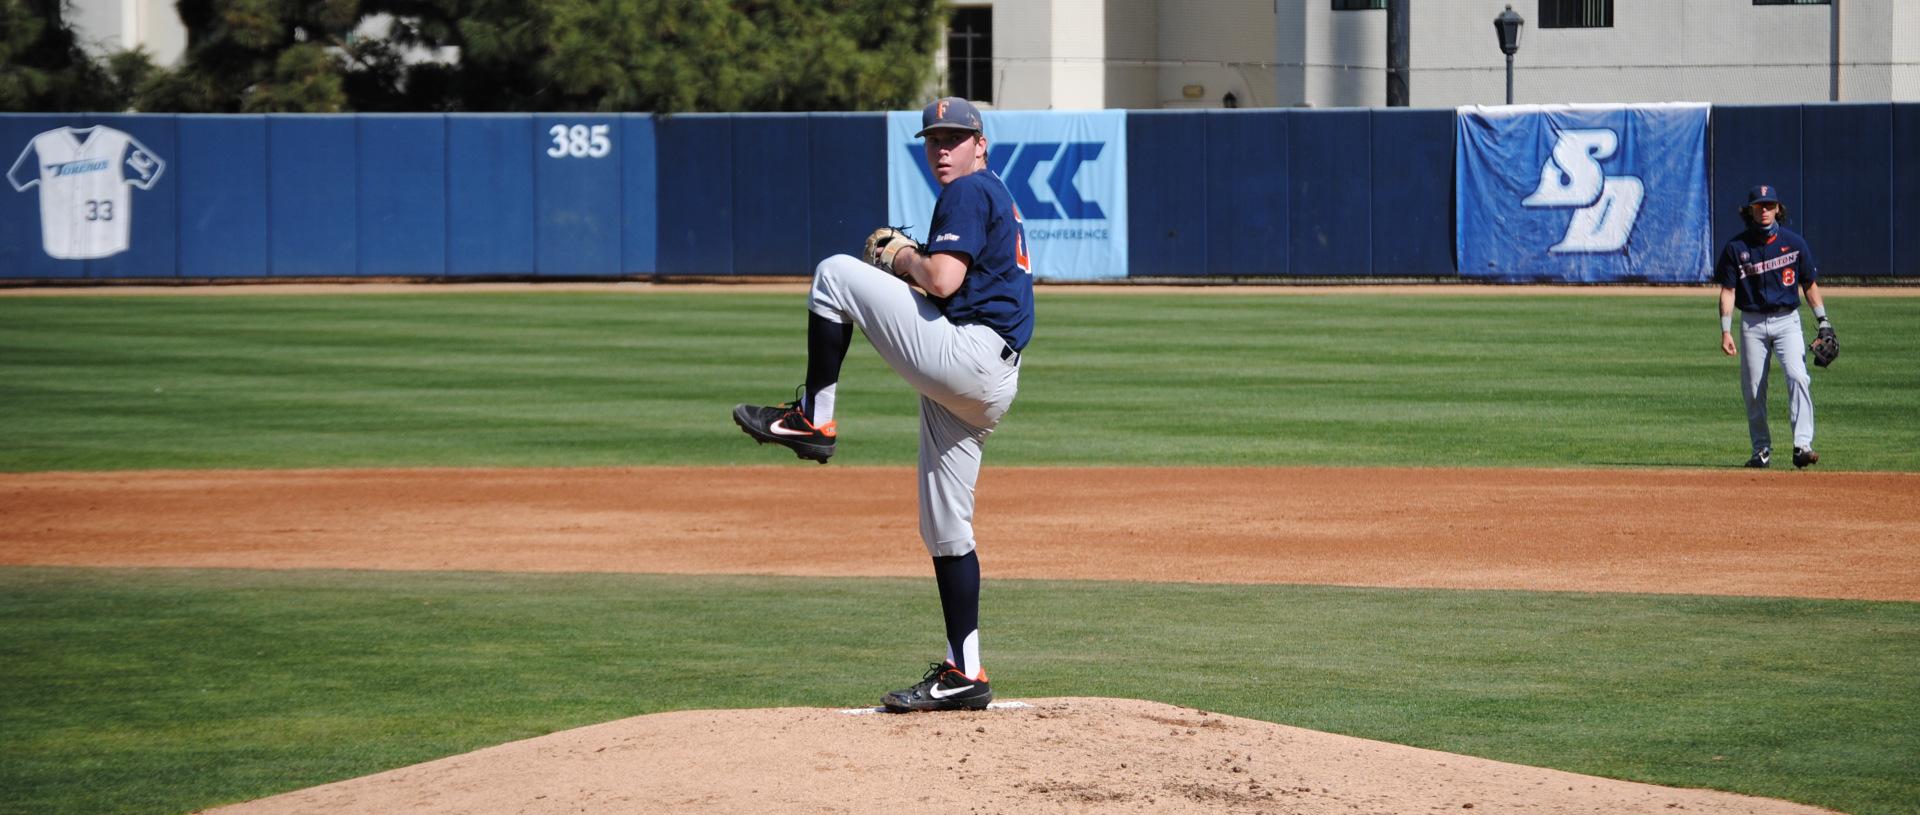 Kyle Luckham pitching vs USD